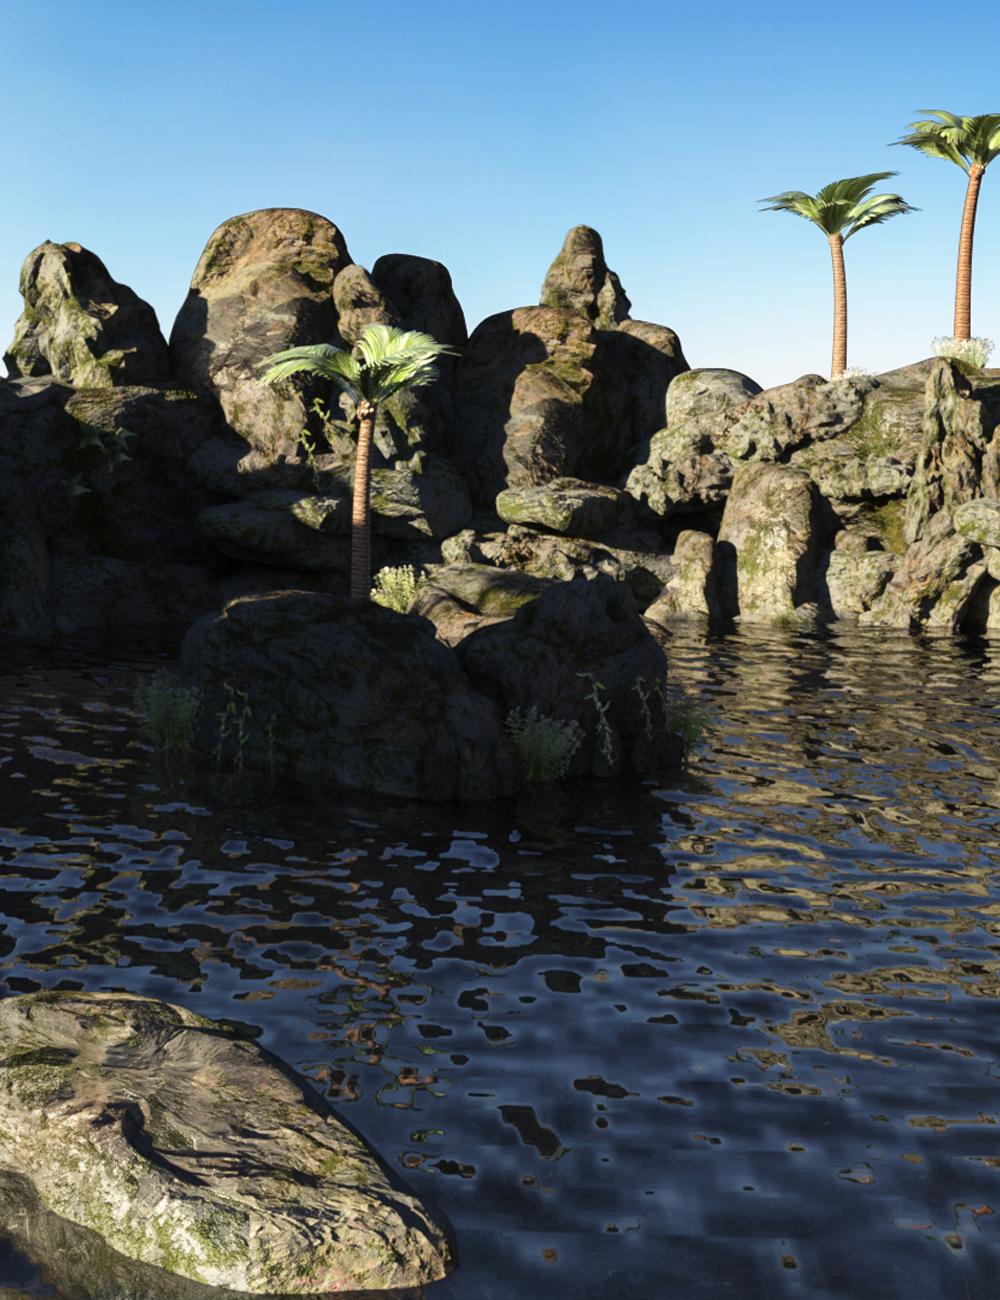 Mermaid Lagoon by: bituka3d, 3D Models by Daz 3D